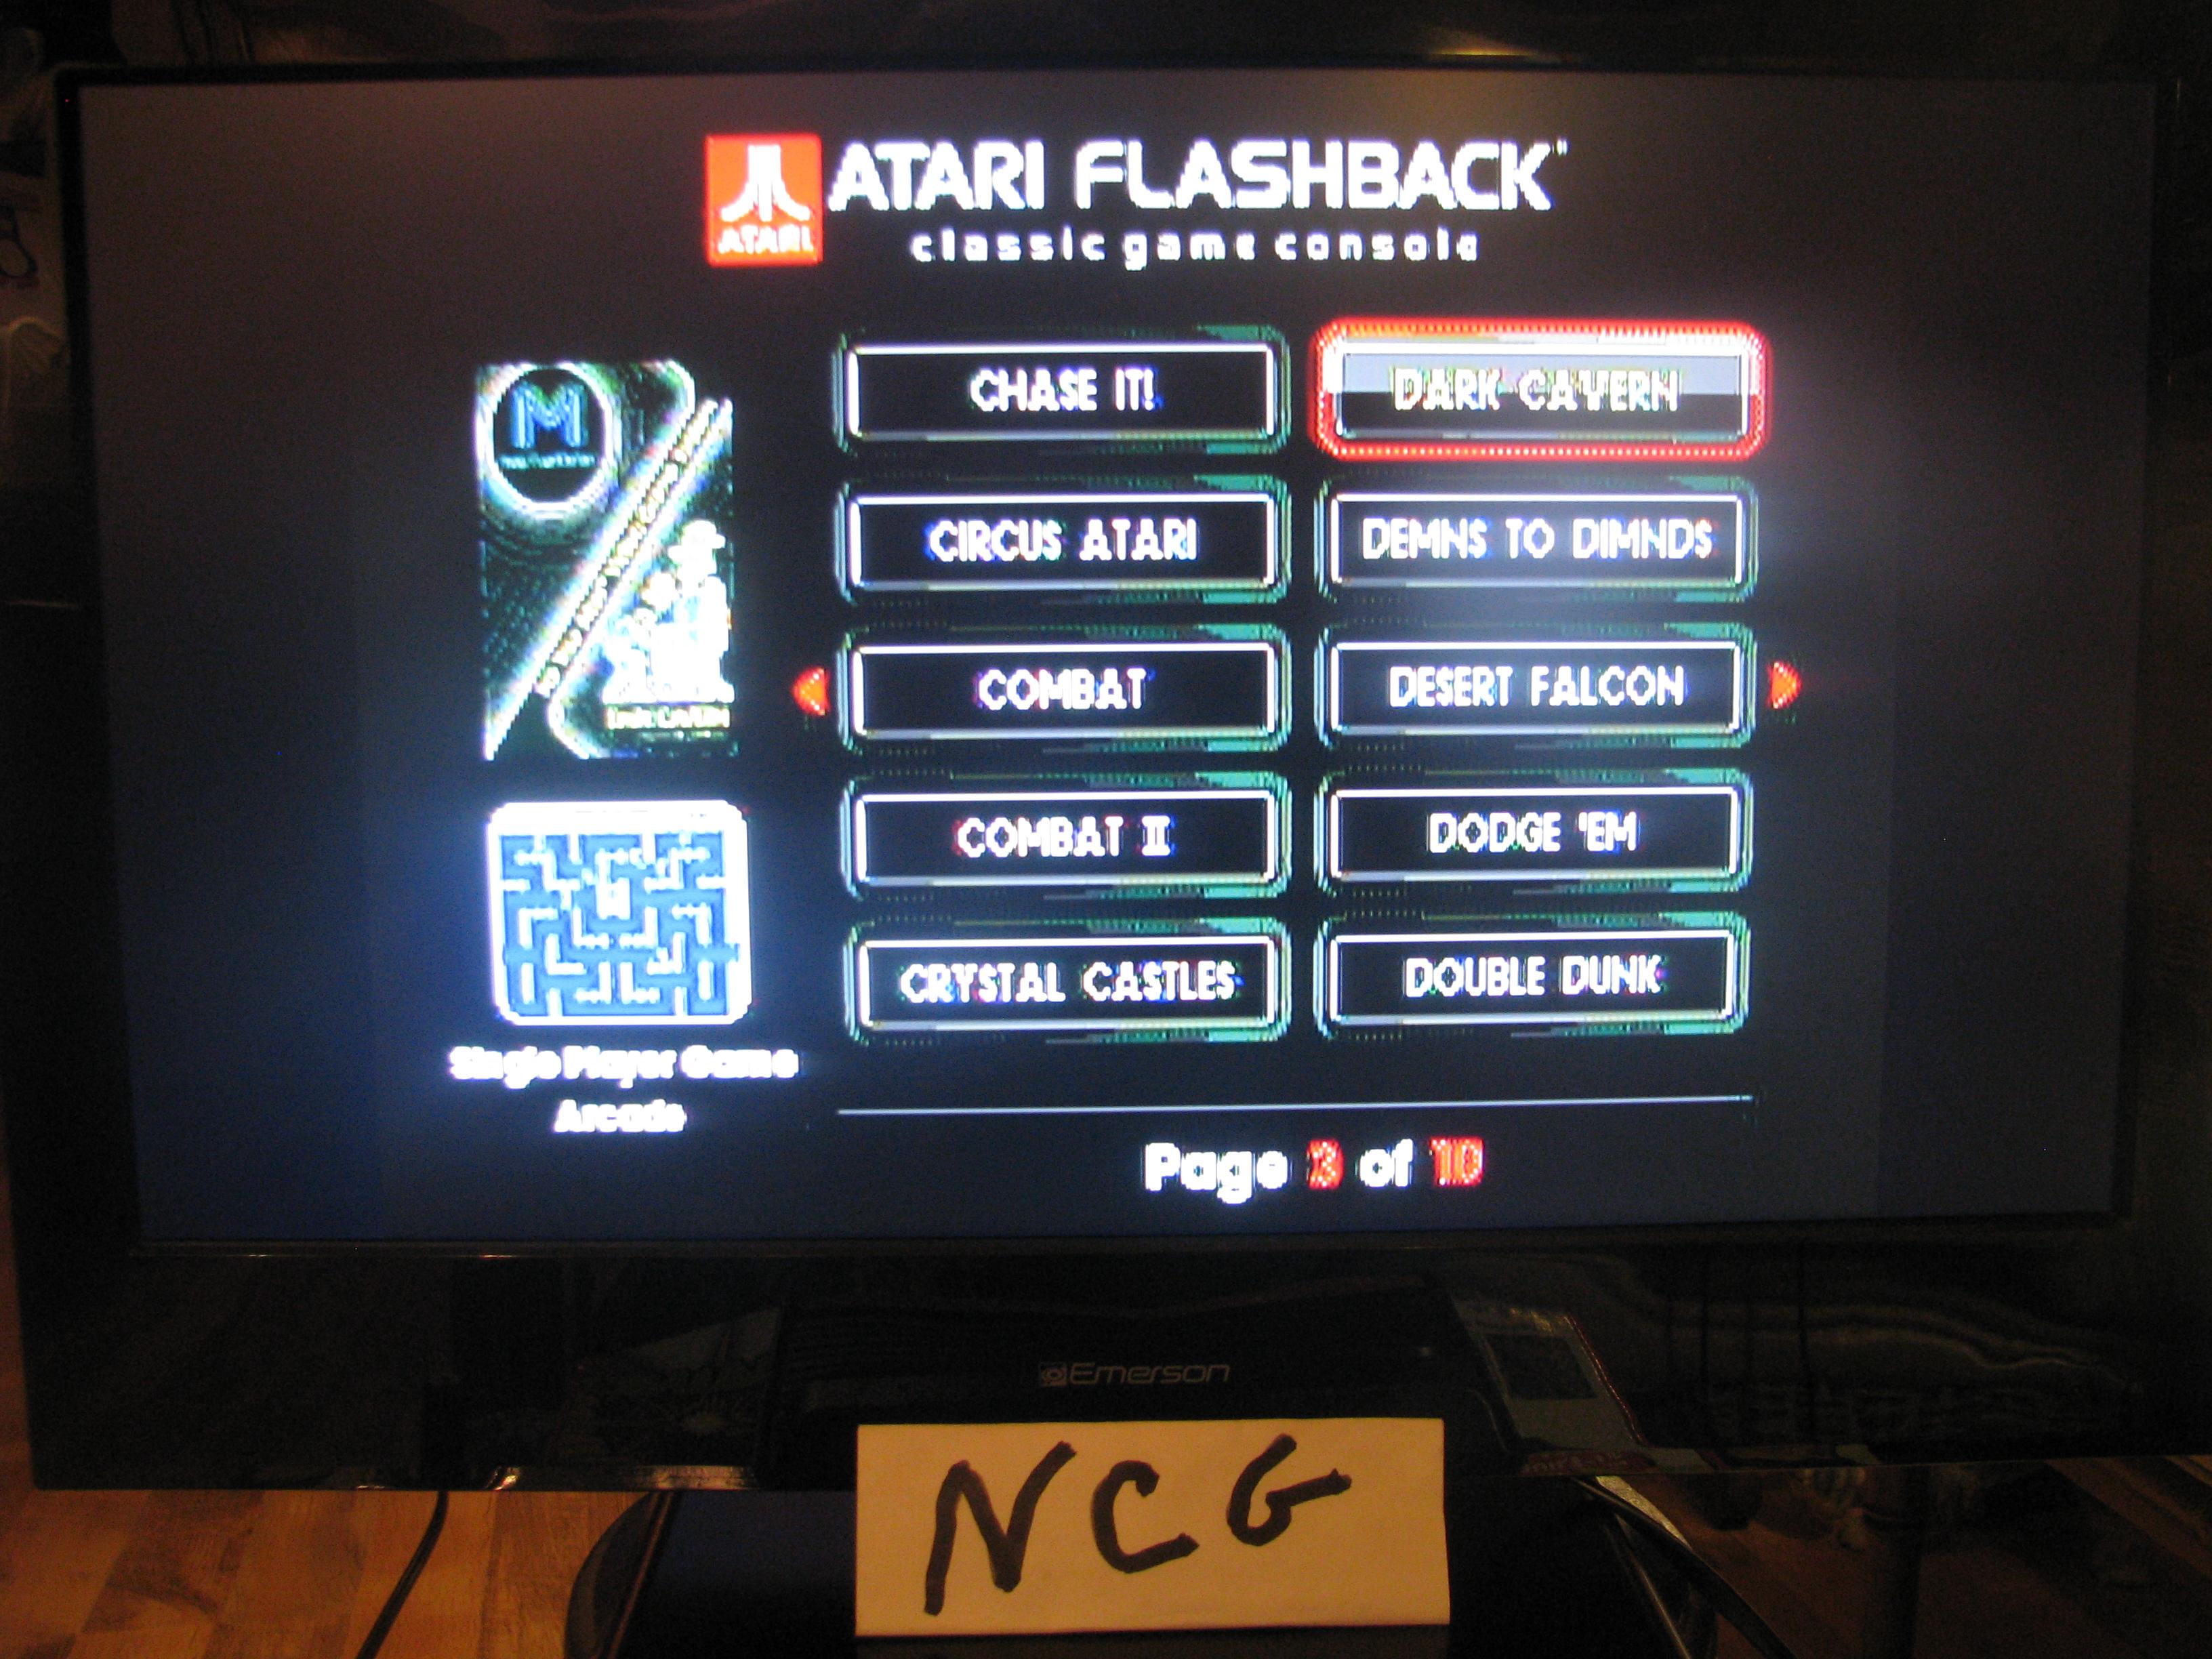 NorthCoastGamer: Dark Cavern (Atari Flashback 5) 222,000 points on 2015-01-10 20:07:34